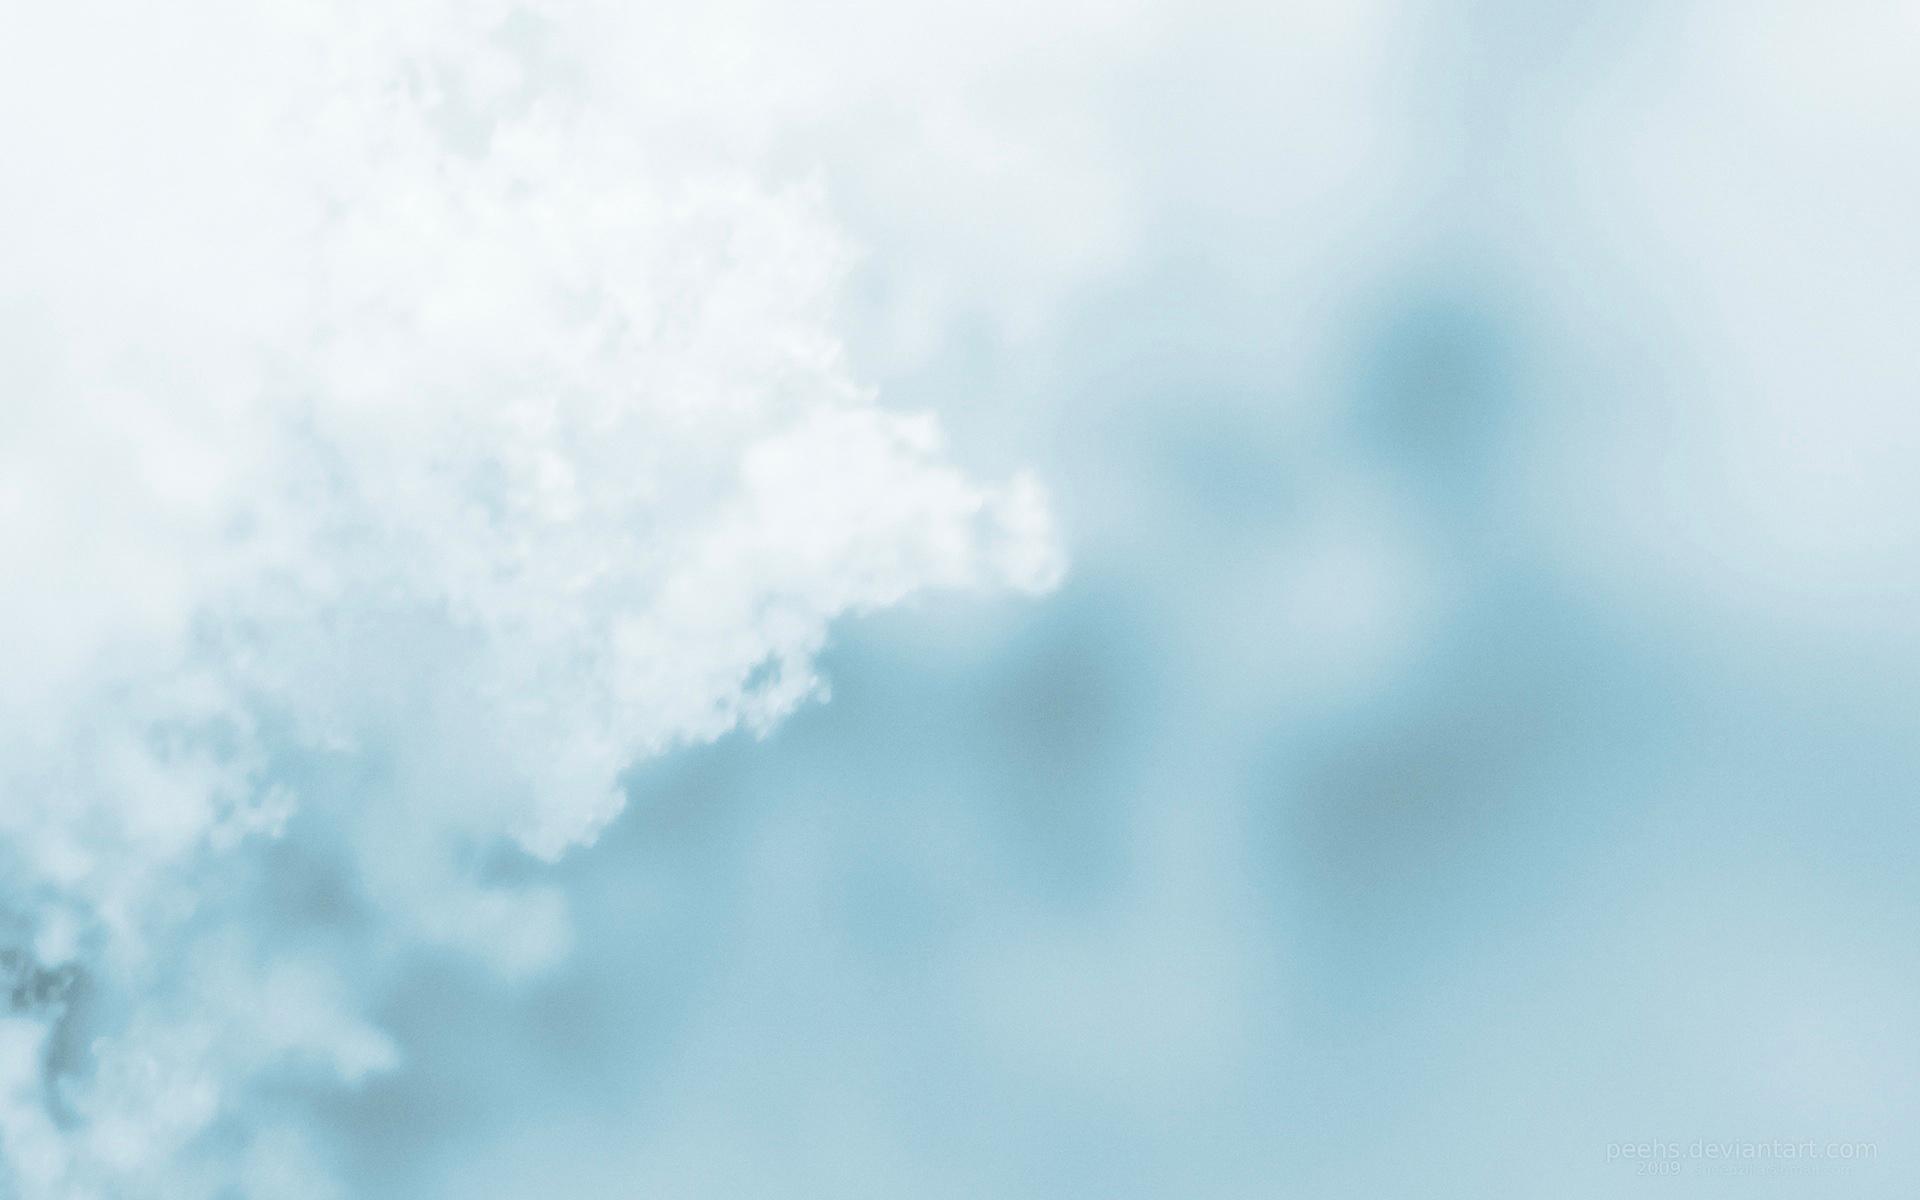 The dream cloud wallpaper Desktop Background Scenery Wallpapers 1920x1200